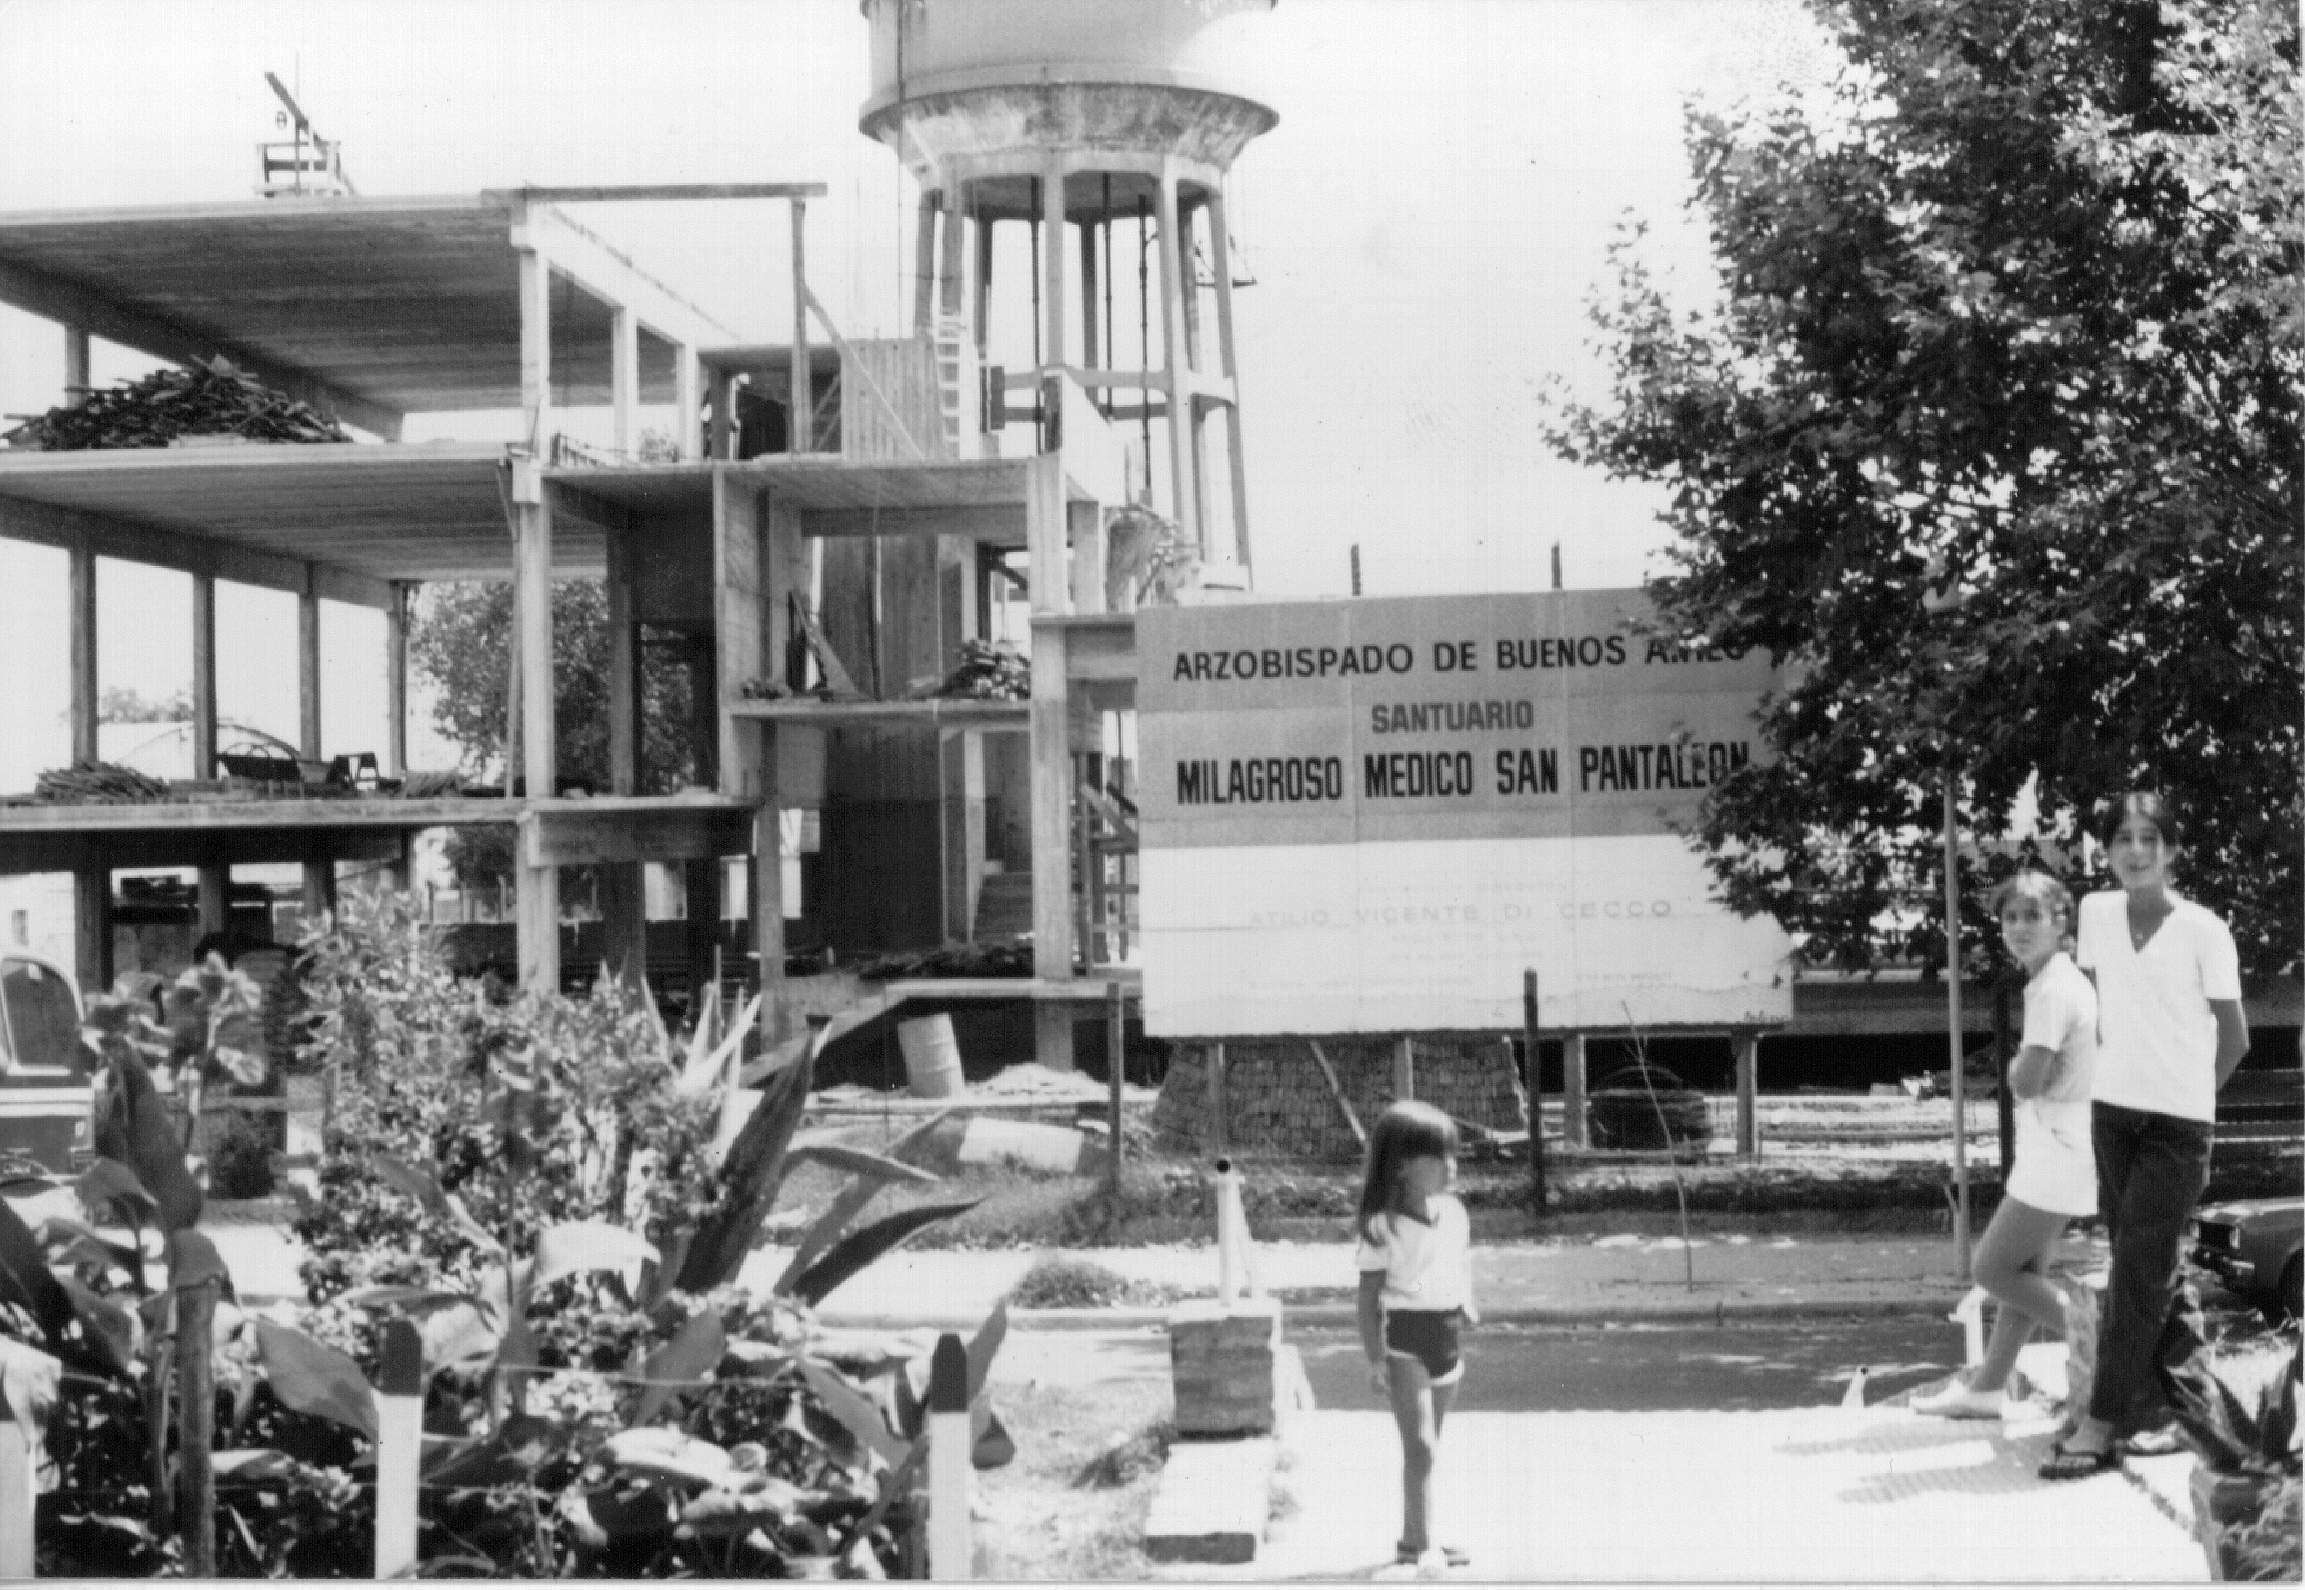 7-Nuevo Templo 2 (marzo 82)